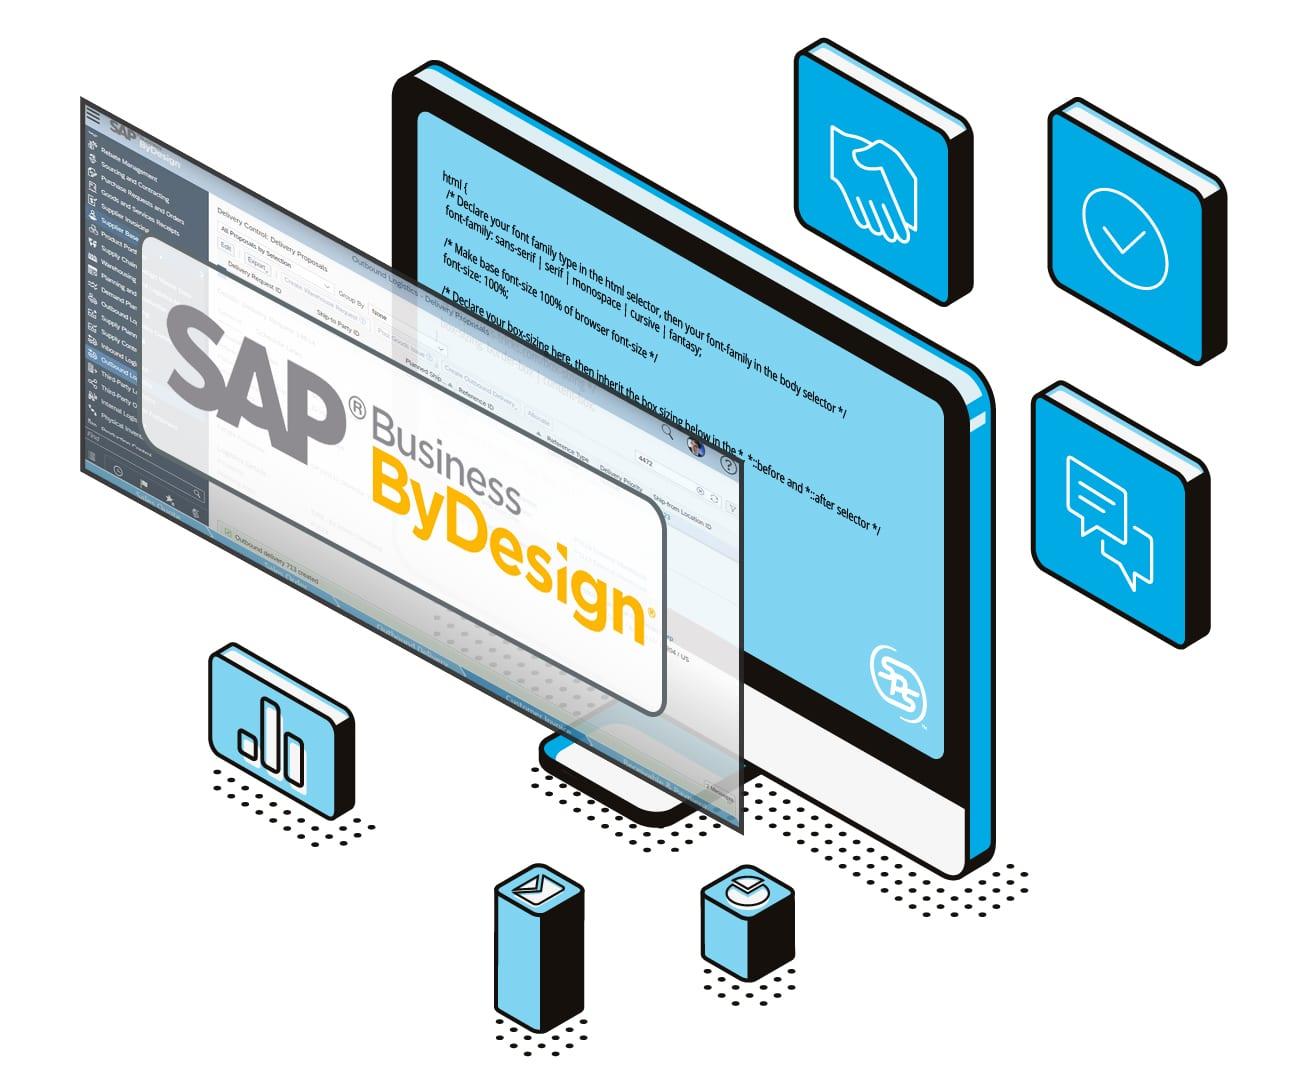 SAP ByDesign EDI Integration from SPS Commerce